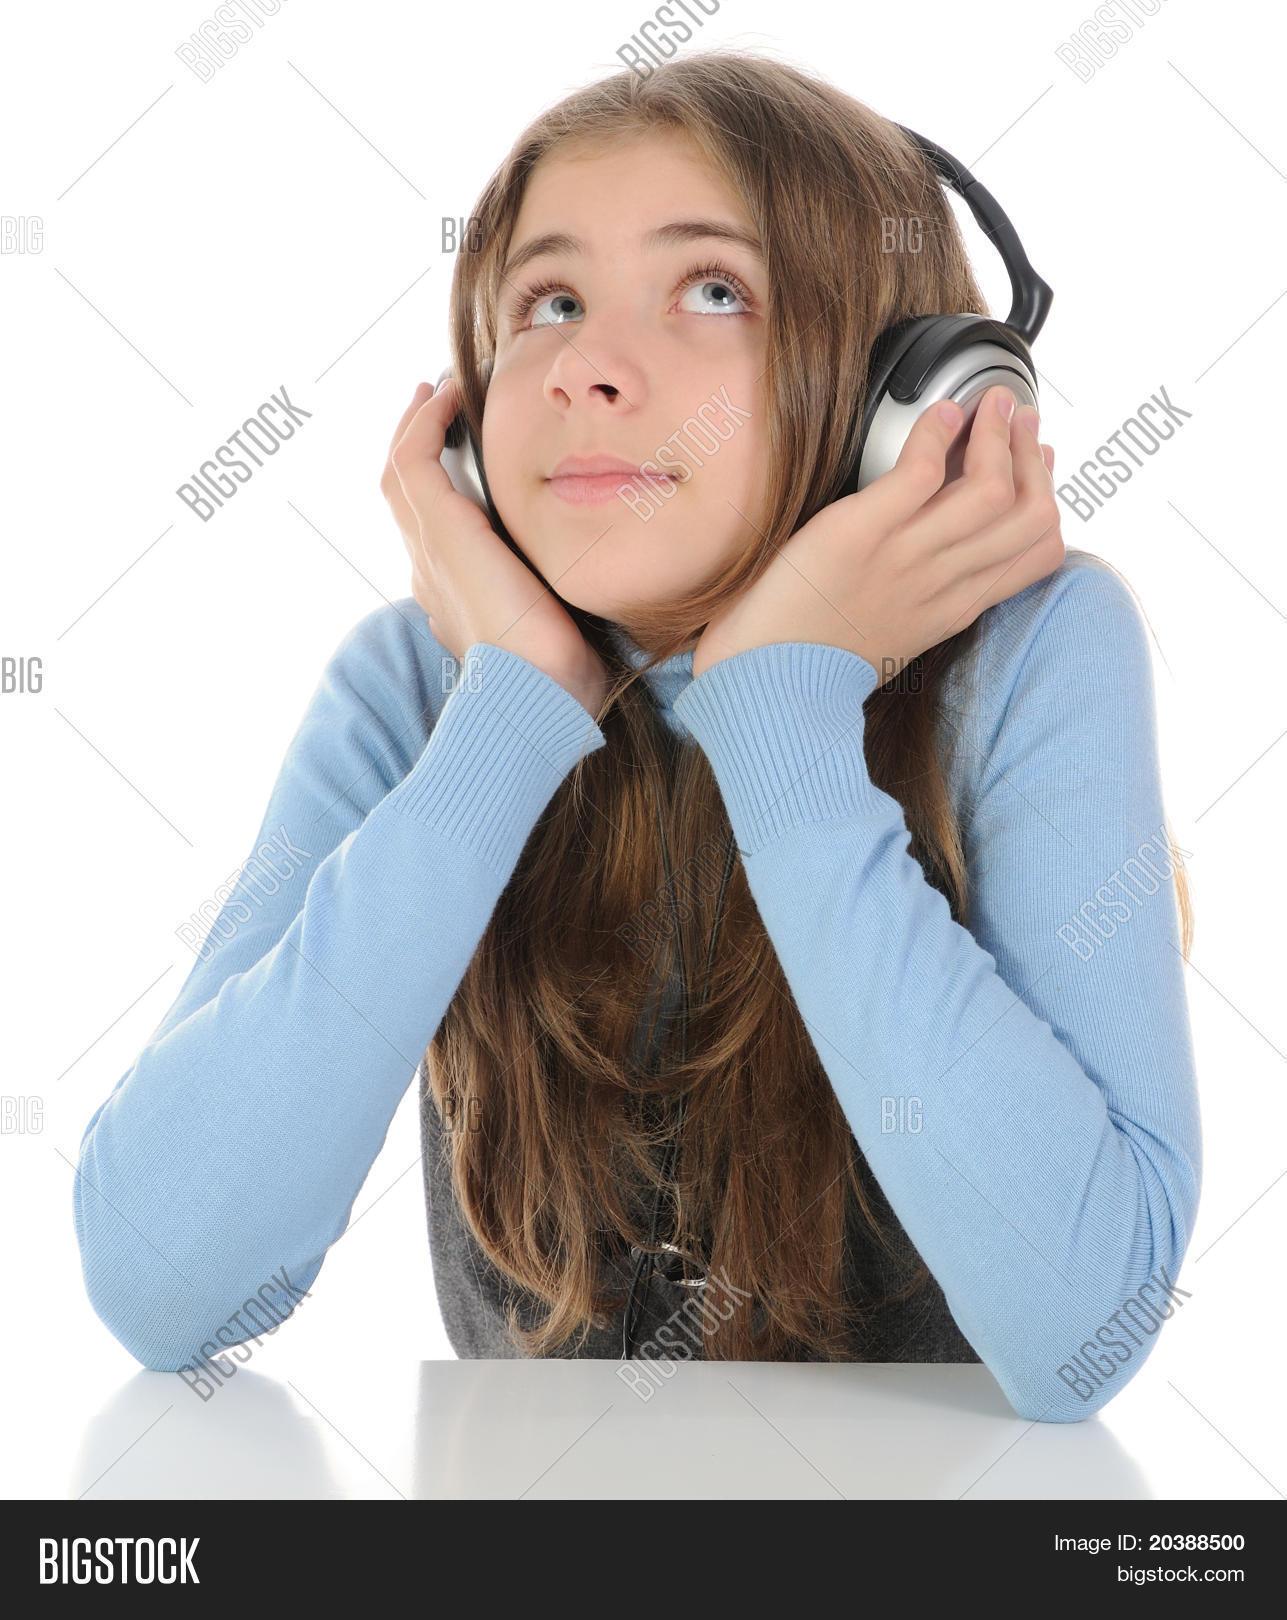 b605237a6 http   www.bigstock.com.br image-20388233 stock-photo-retrato-de ...